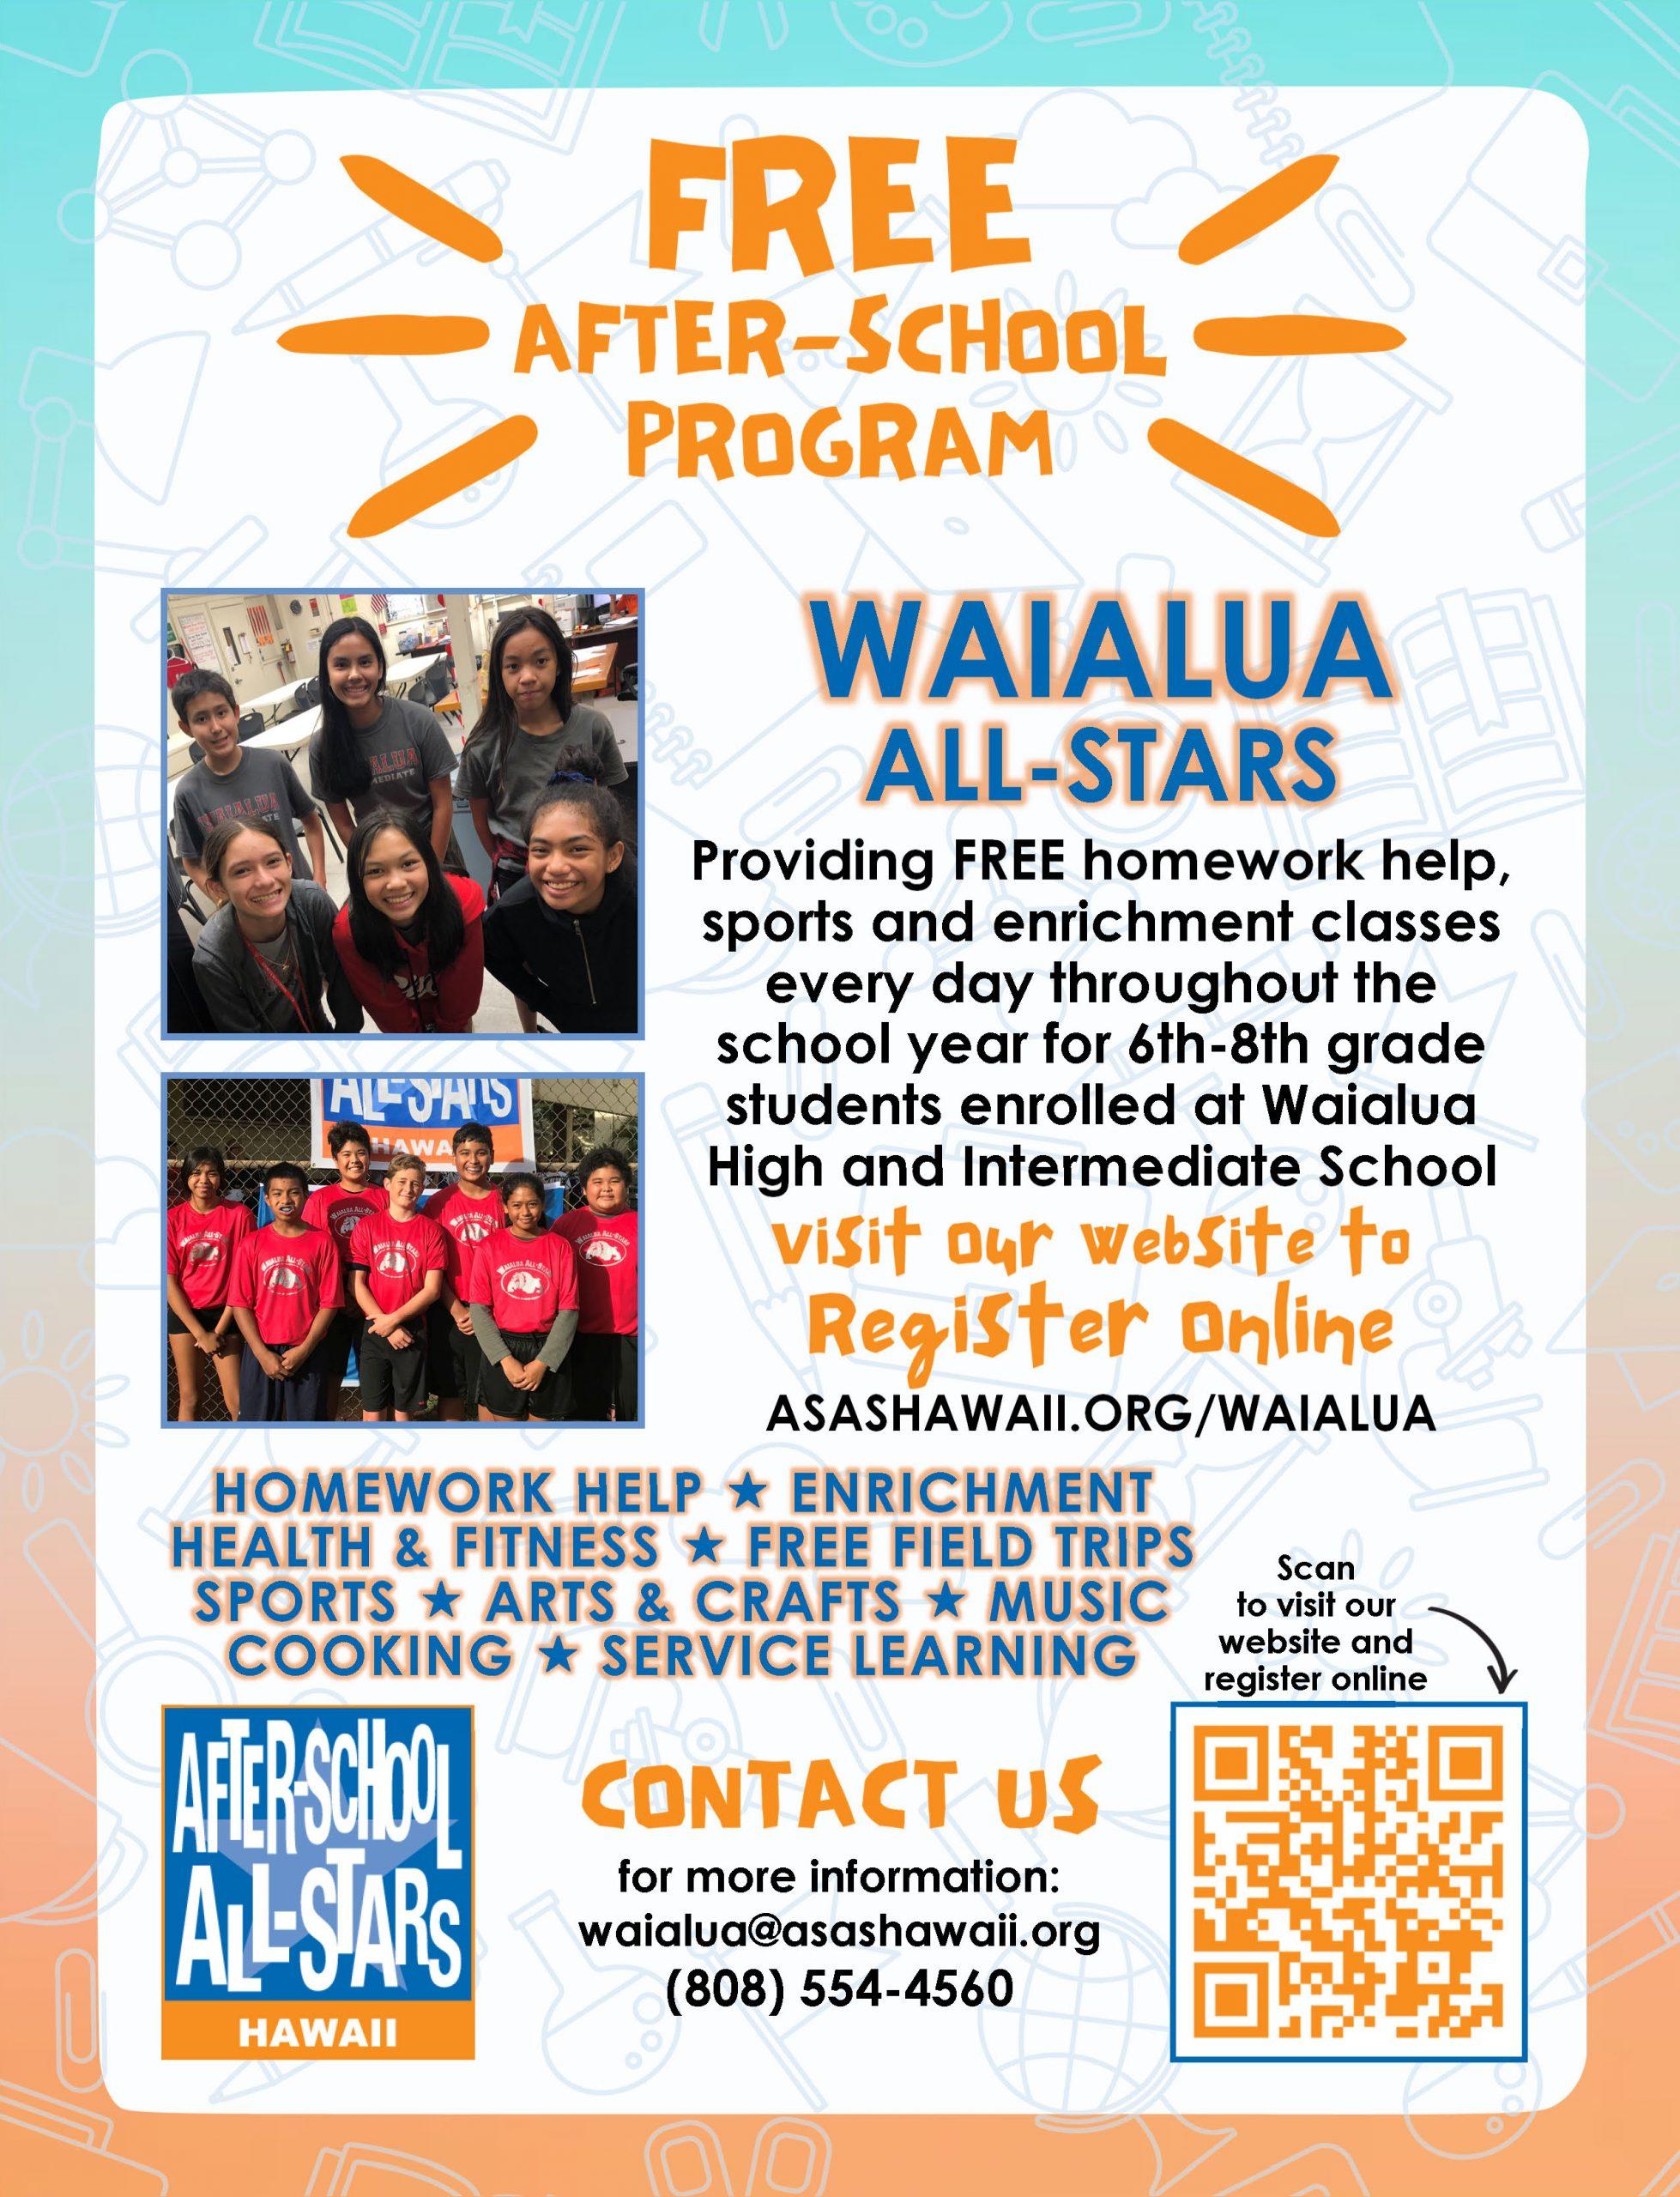 Waialua All-Stars